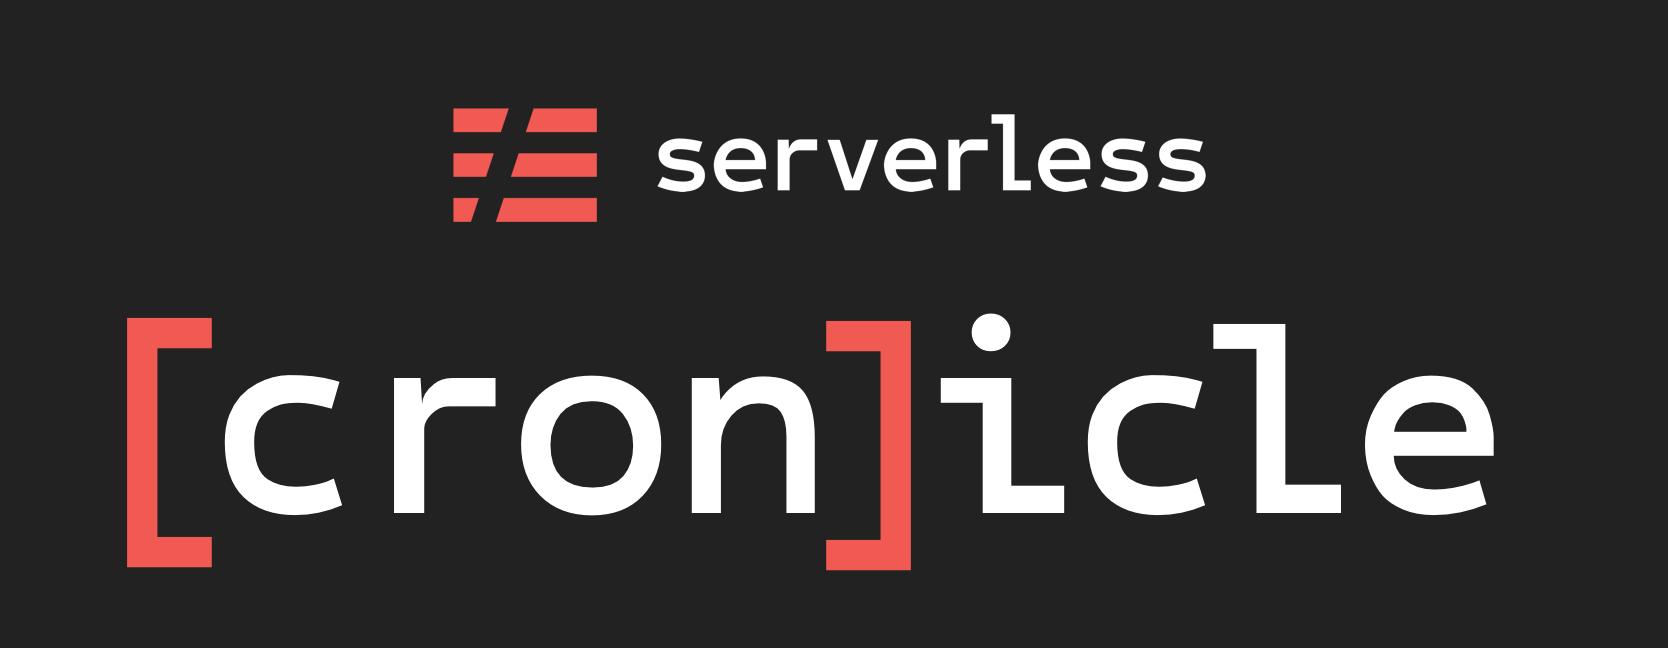 Serverless [Cron]icle